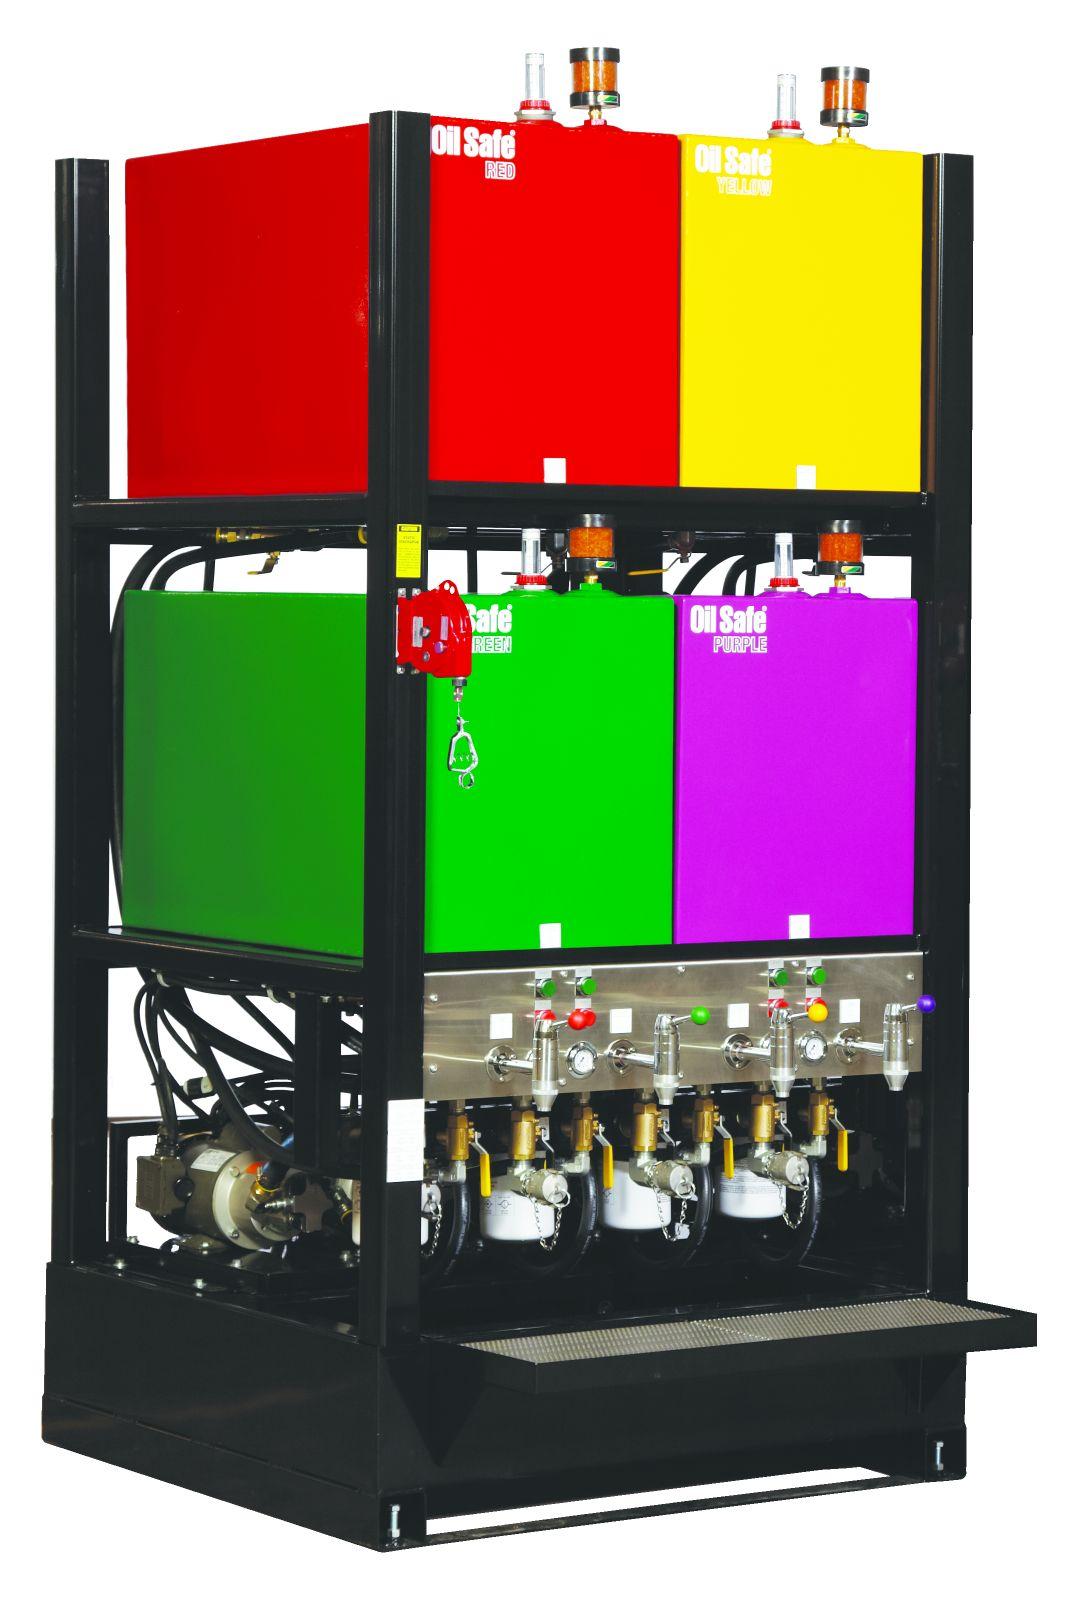 Oil Safe 174 Advanced Bulk Storage Systems On Lubrication